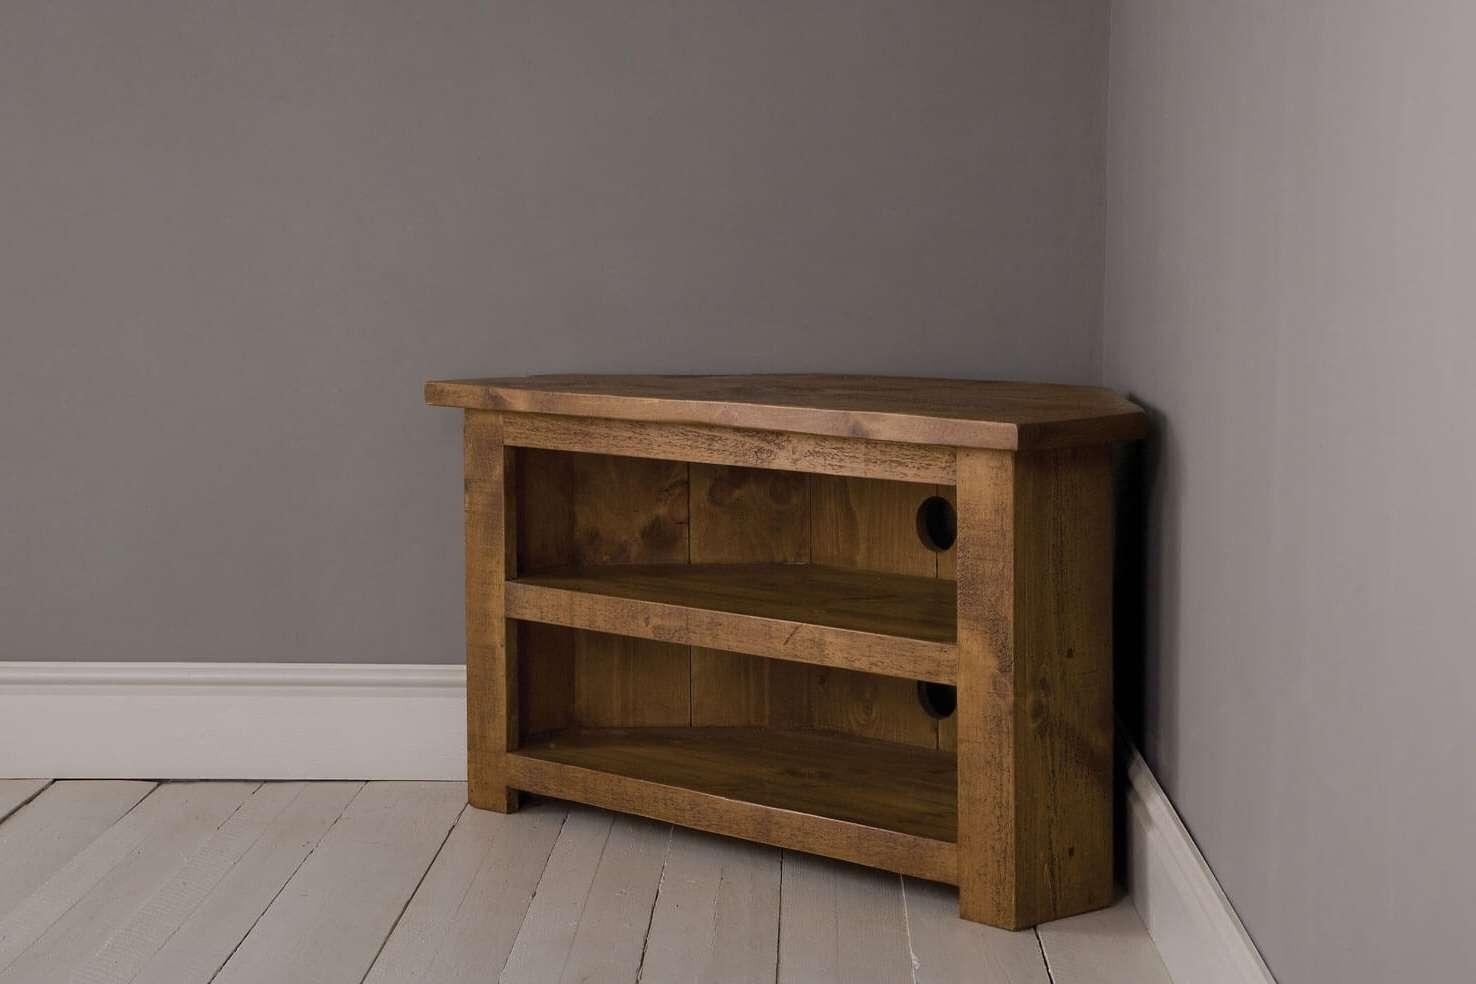 Plank Corner Tv Unit With Shelfindigo Furniture Regarding Wood Corner Tv Cabinets (View 10 of 20)